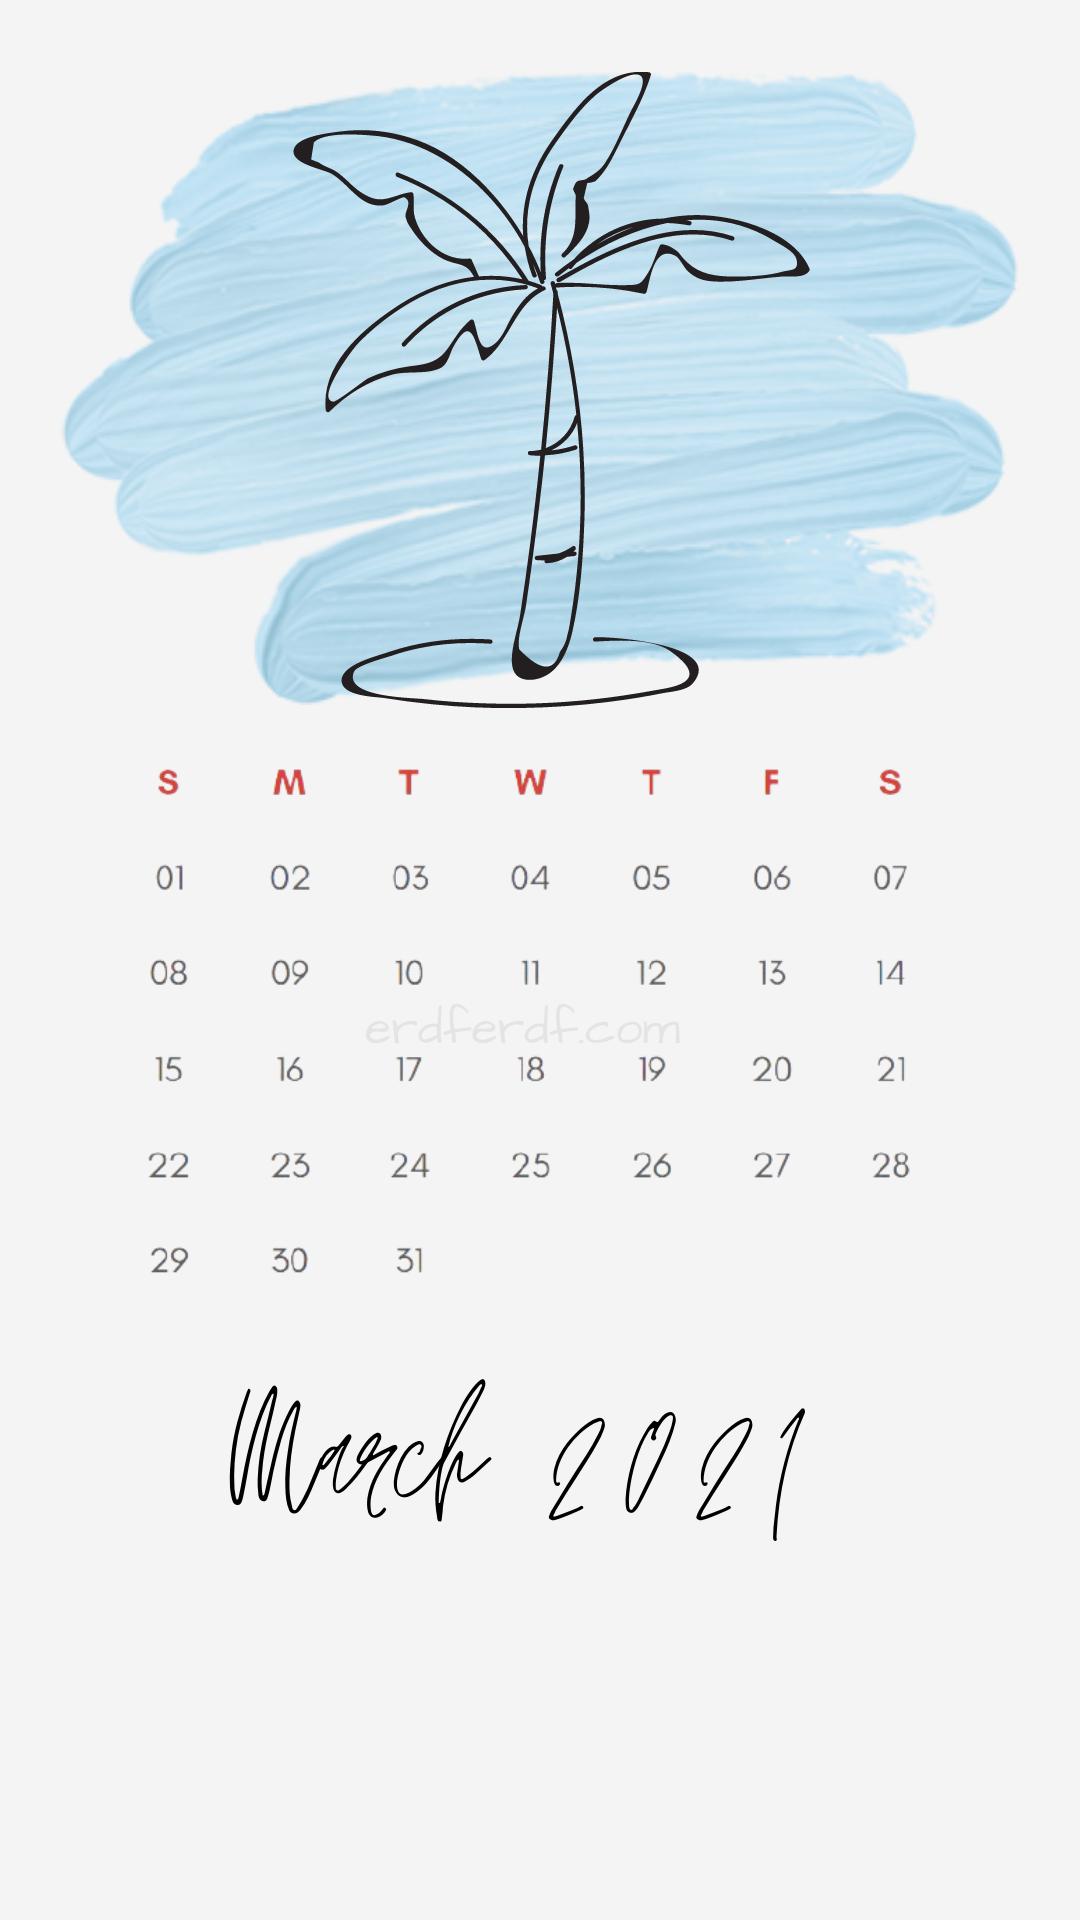 Iphone Wallpaper March 2021 Calendar Free White Banana Tree